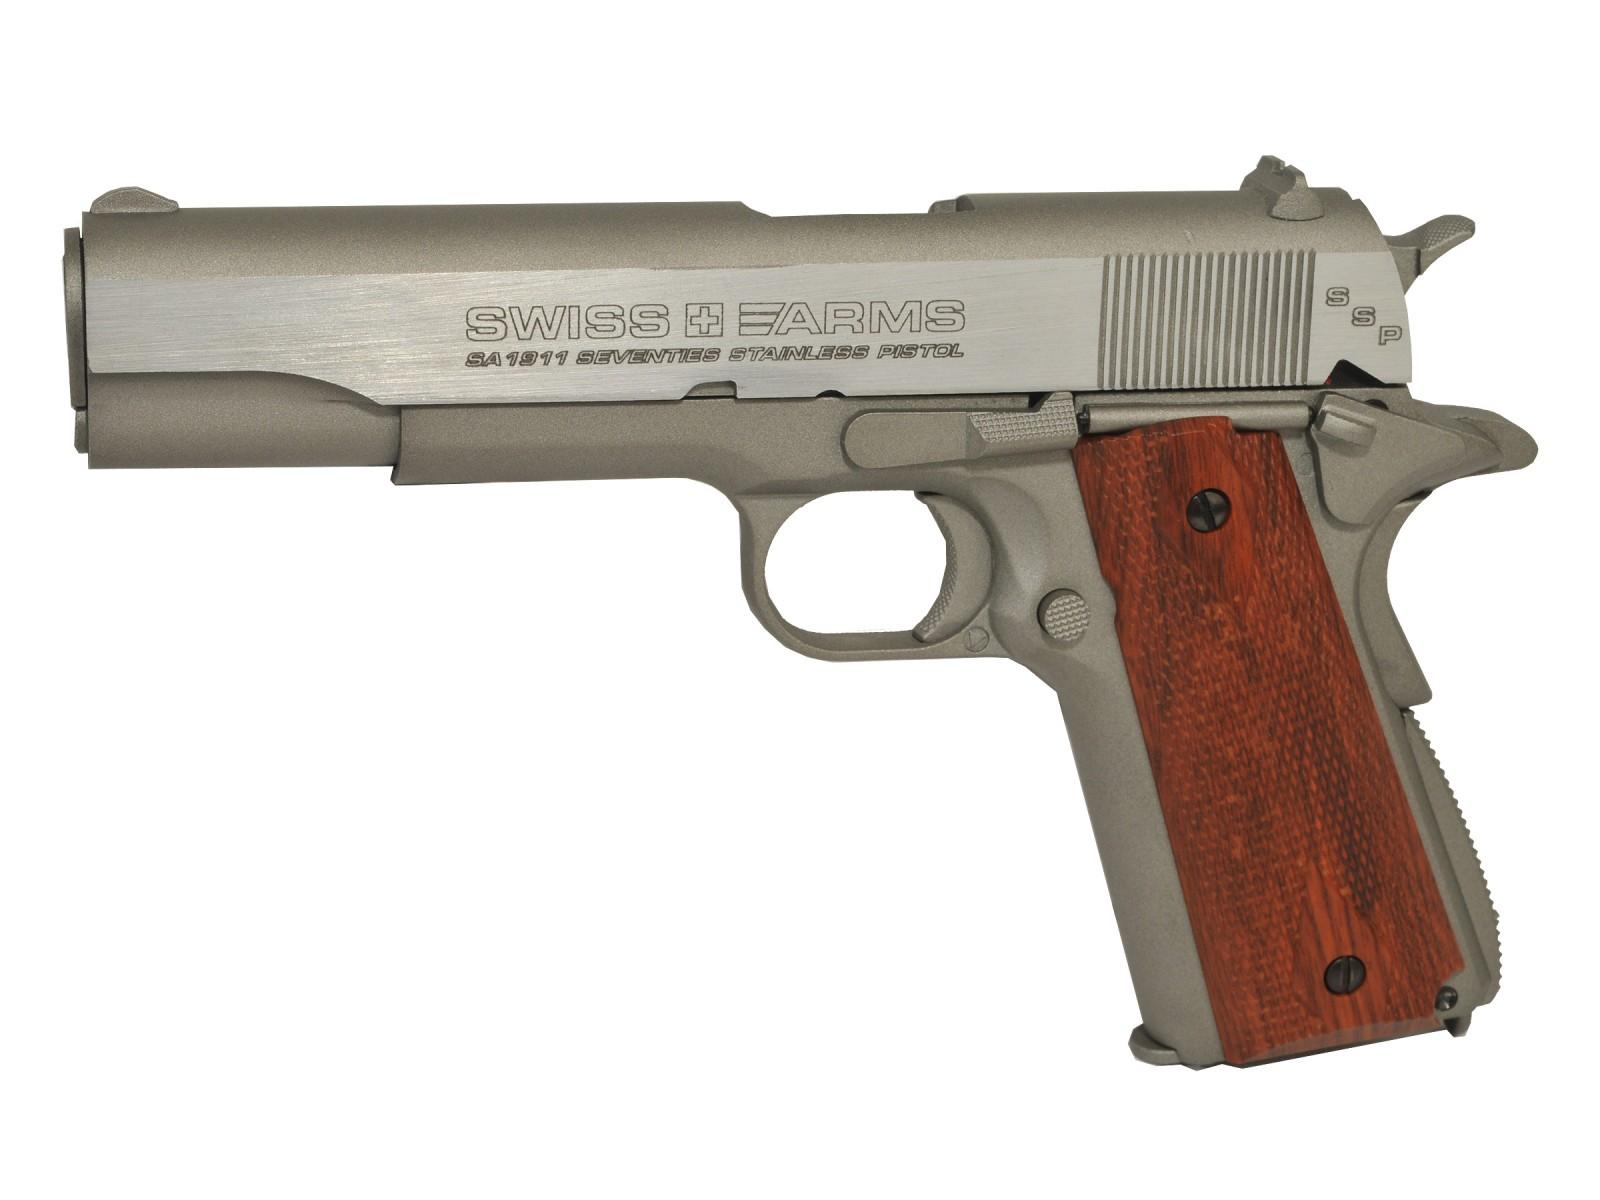 Swiss Arms SA 1911 SSP CO2 BB Pistol, Brown Grips